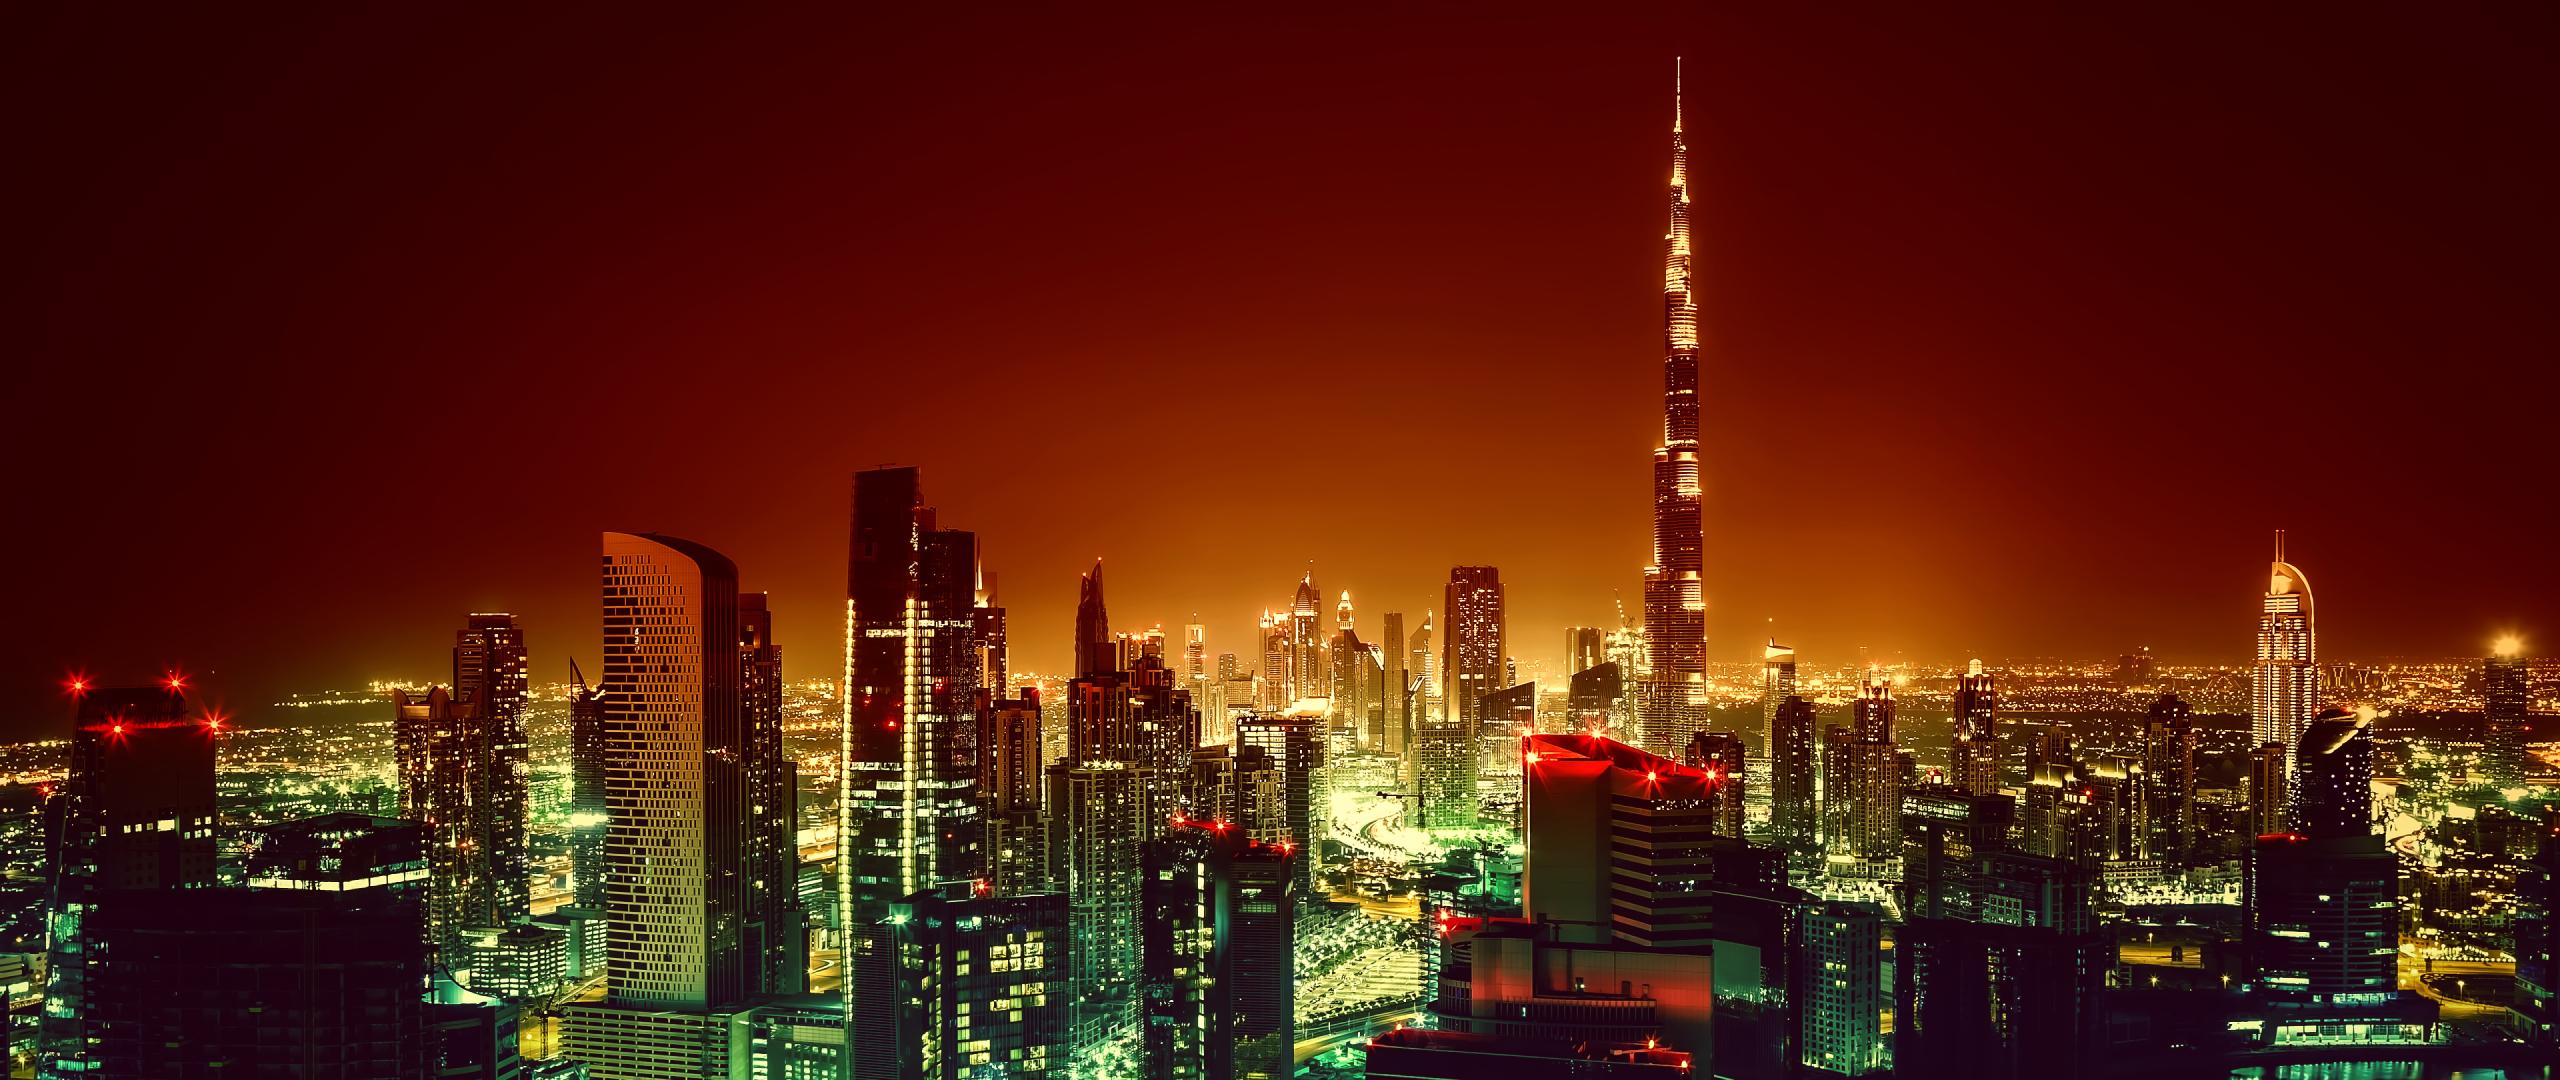 Dubai Burj Khalifa Cityscape In Night, HD 4K Wallpaper